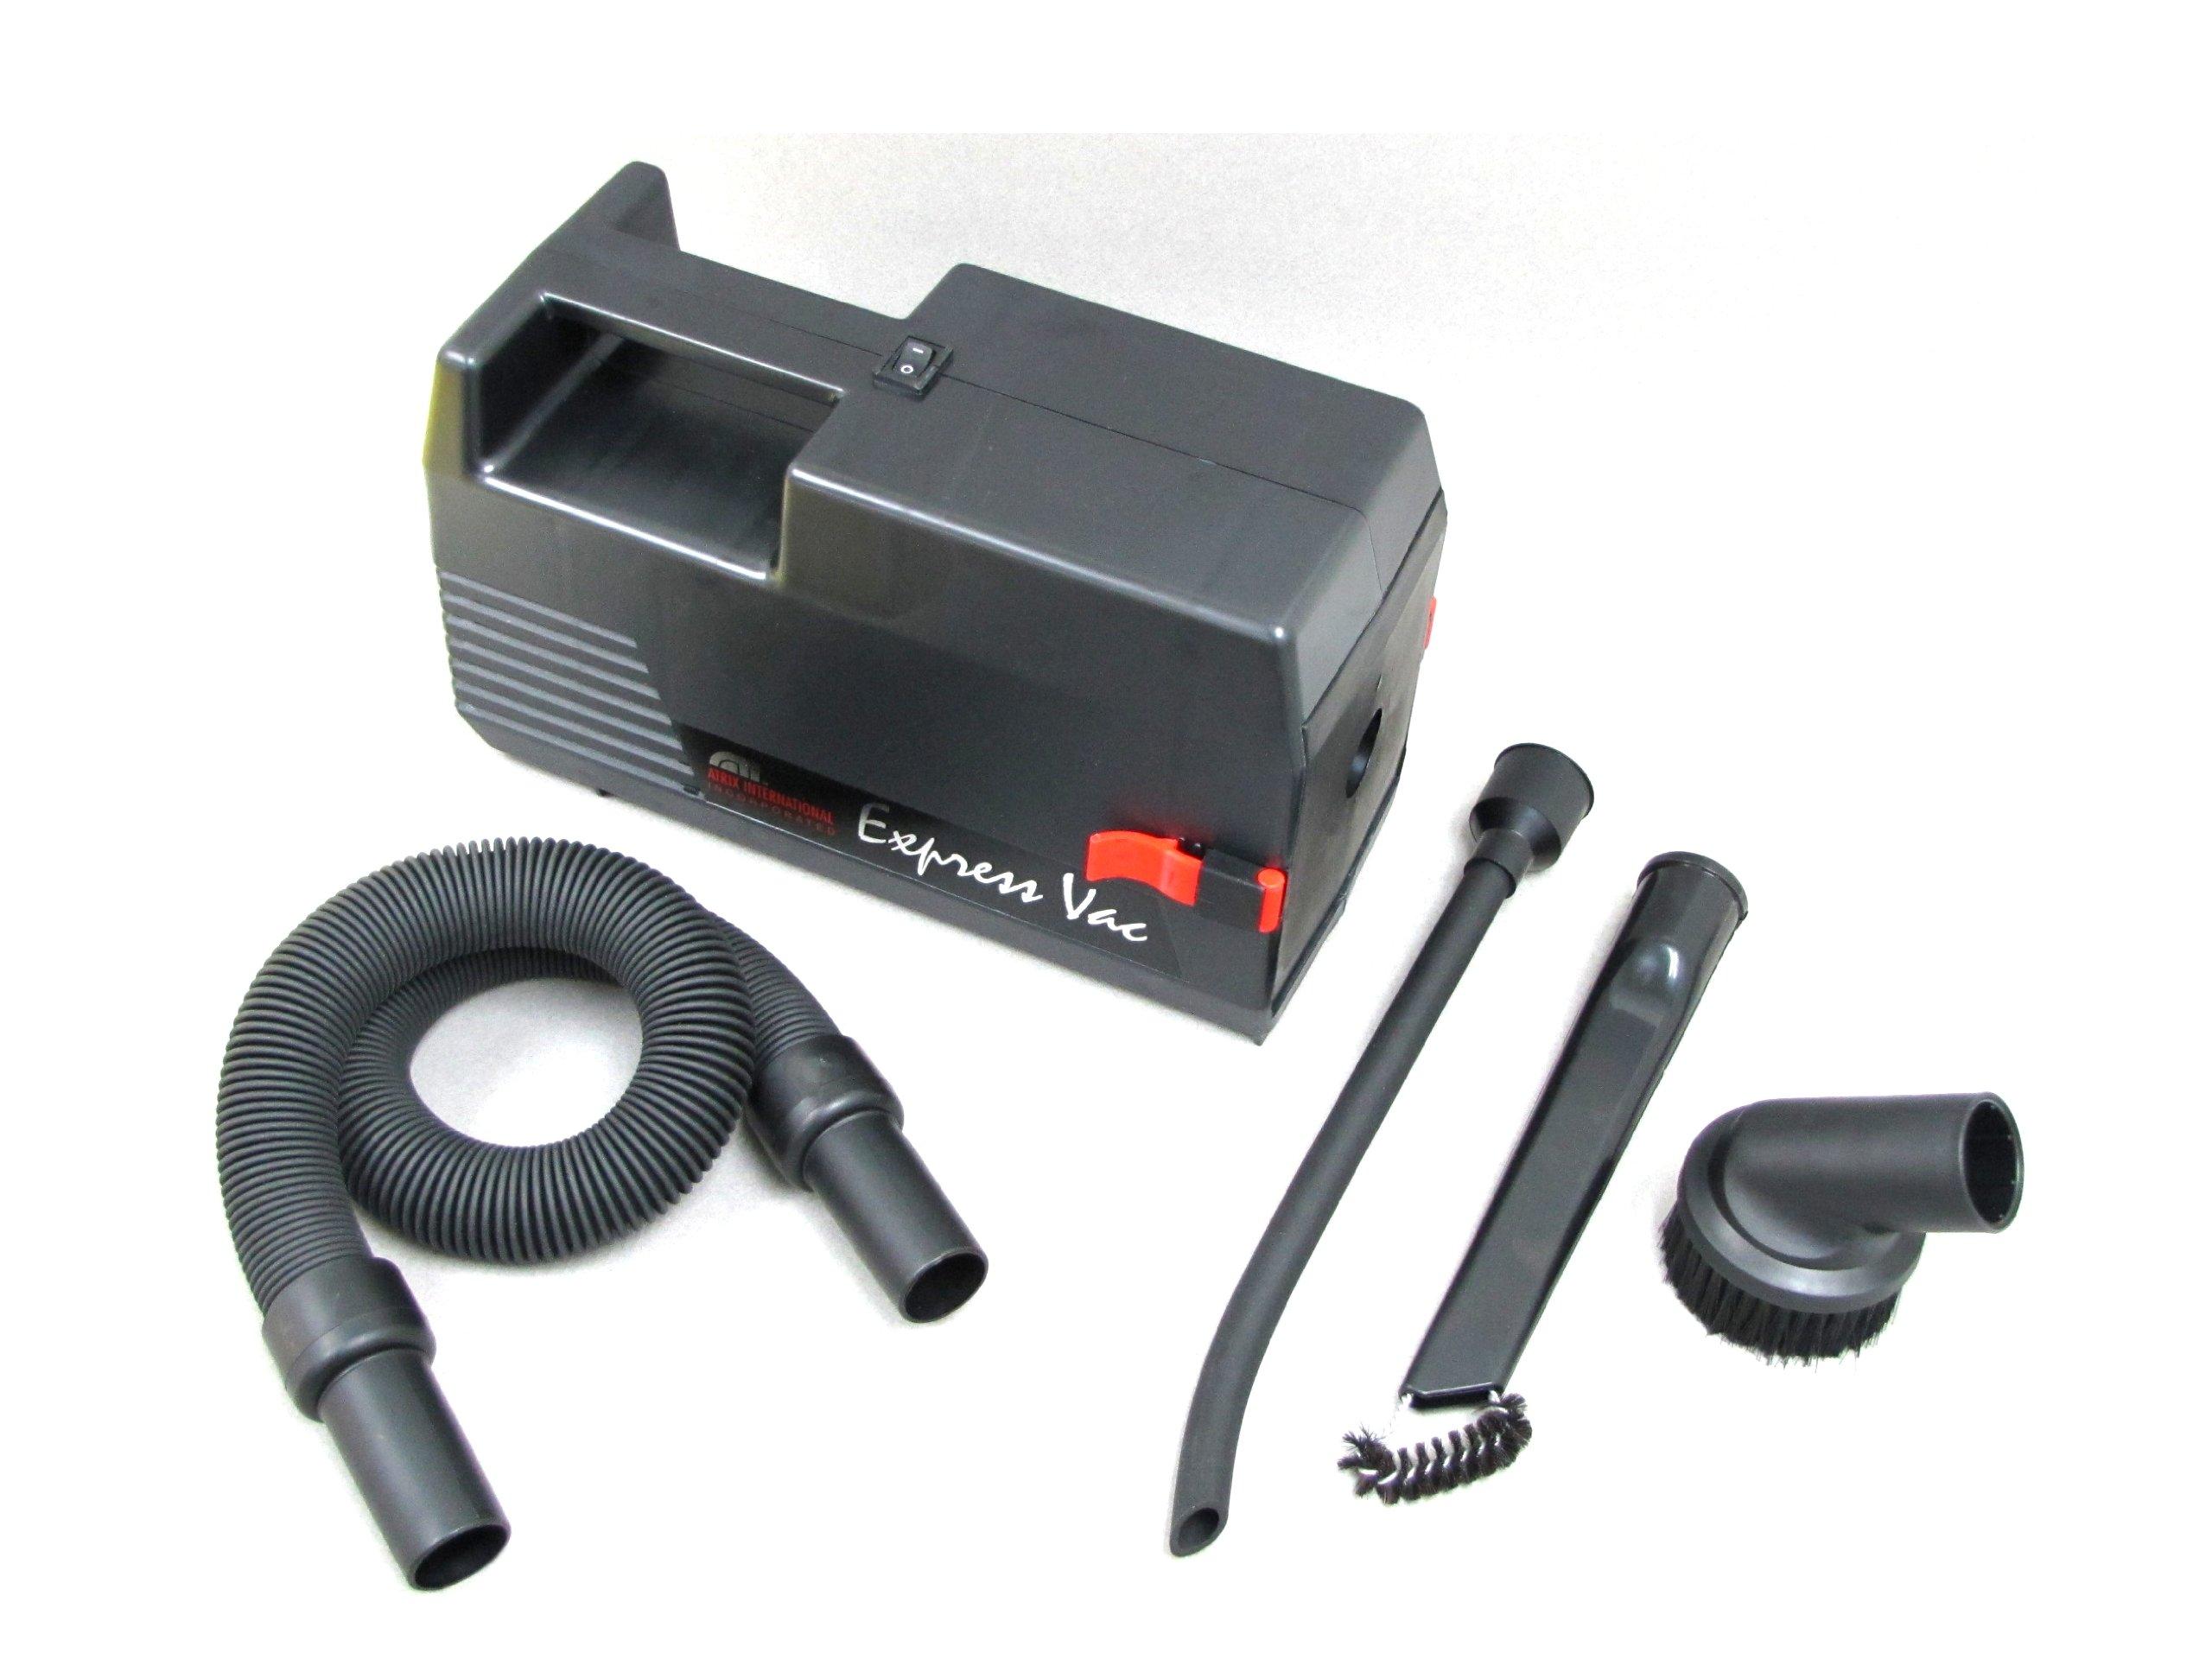 Atrix - VACEXP-04 Express Plus Small Portable Handheld HEPA 100V Vacuum by Atrix